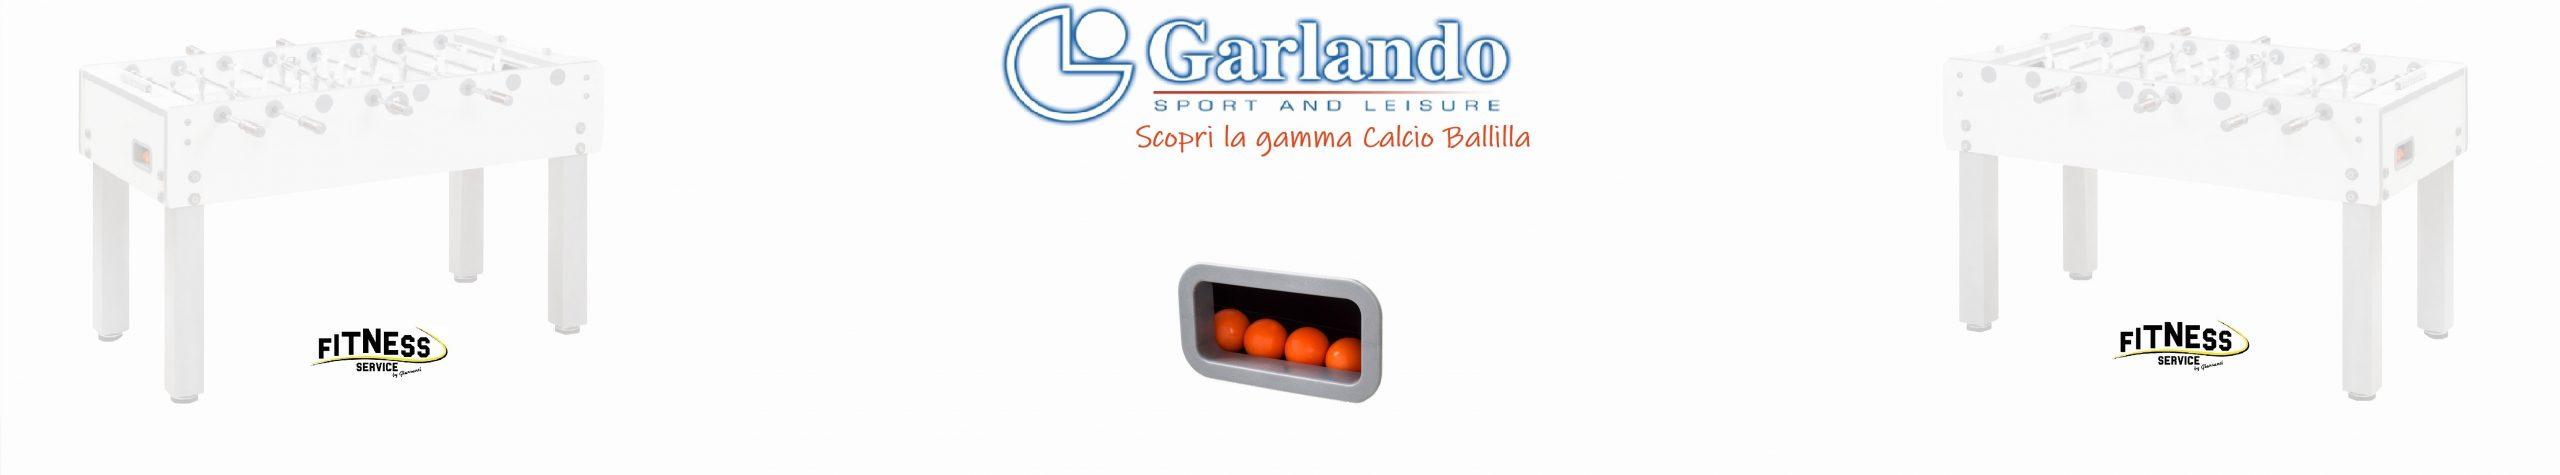 Calcio Balilla G-500 Garlando